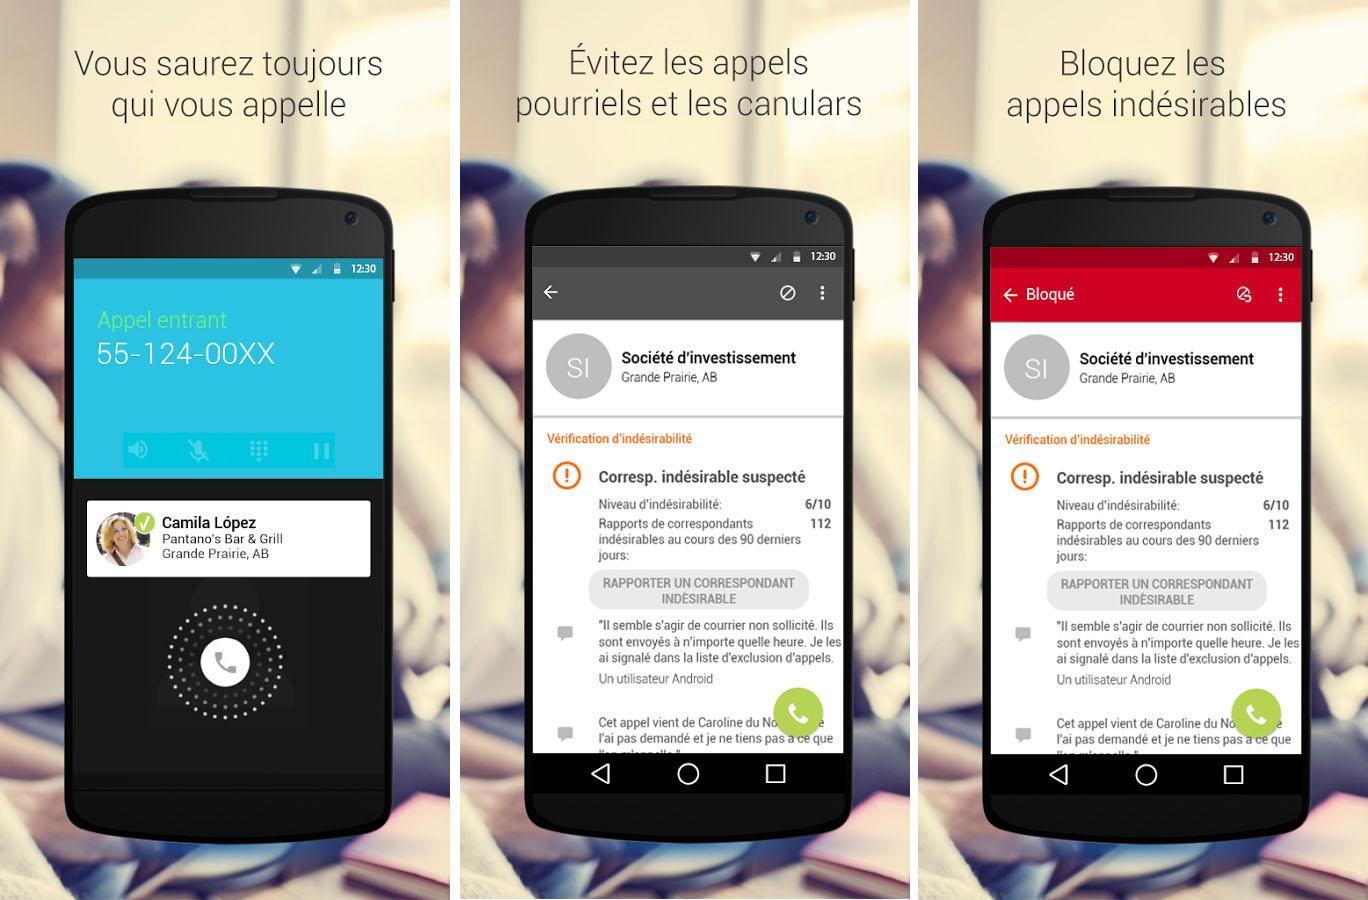 MWC 2016 : WhitePages Caller ID, le système anti-spam intégré au Samsung Galaxy S7